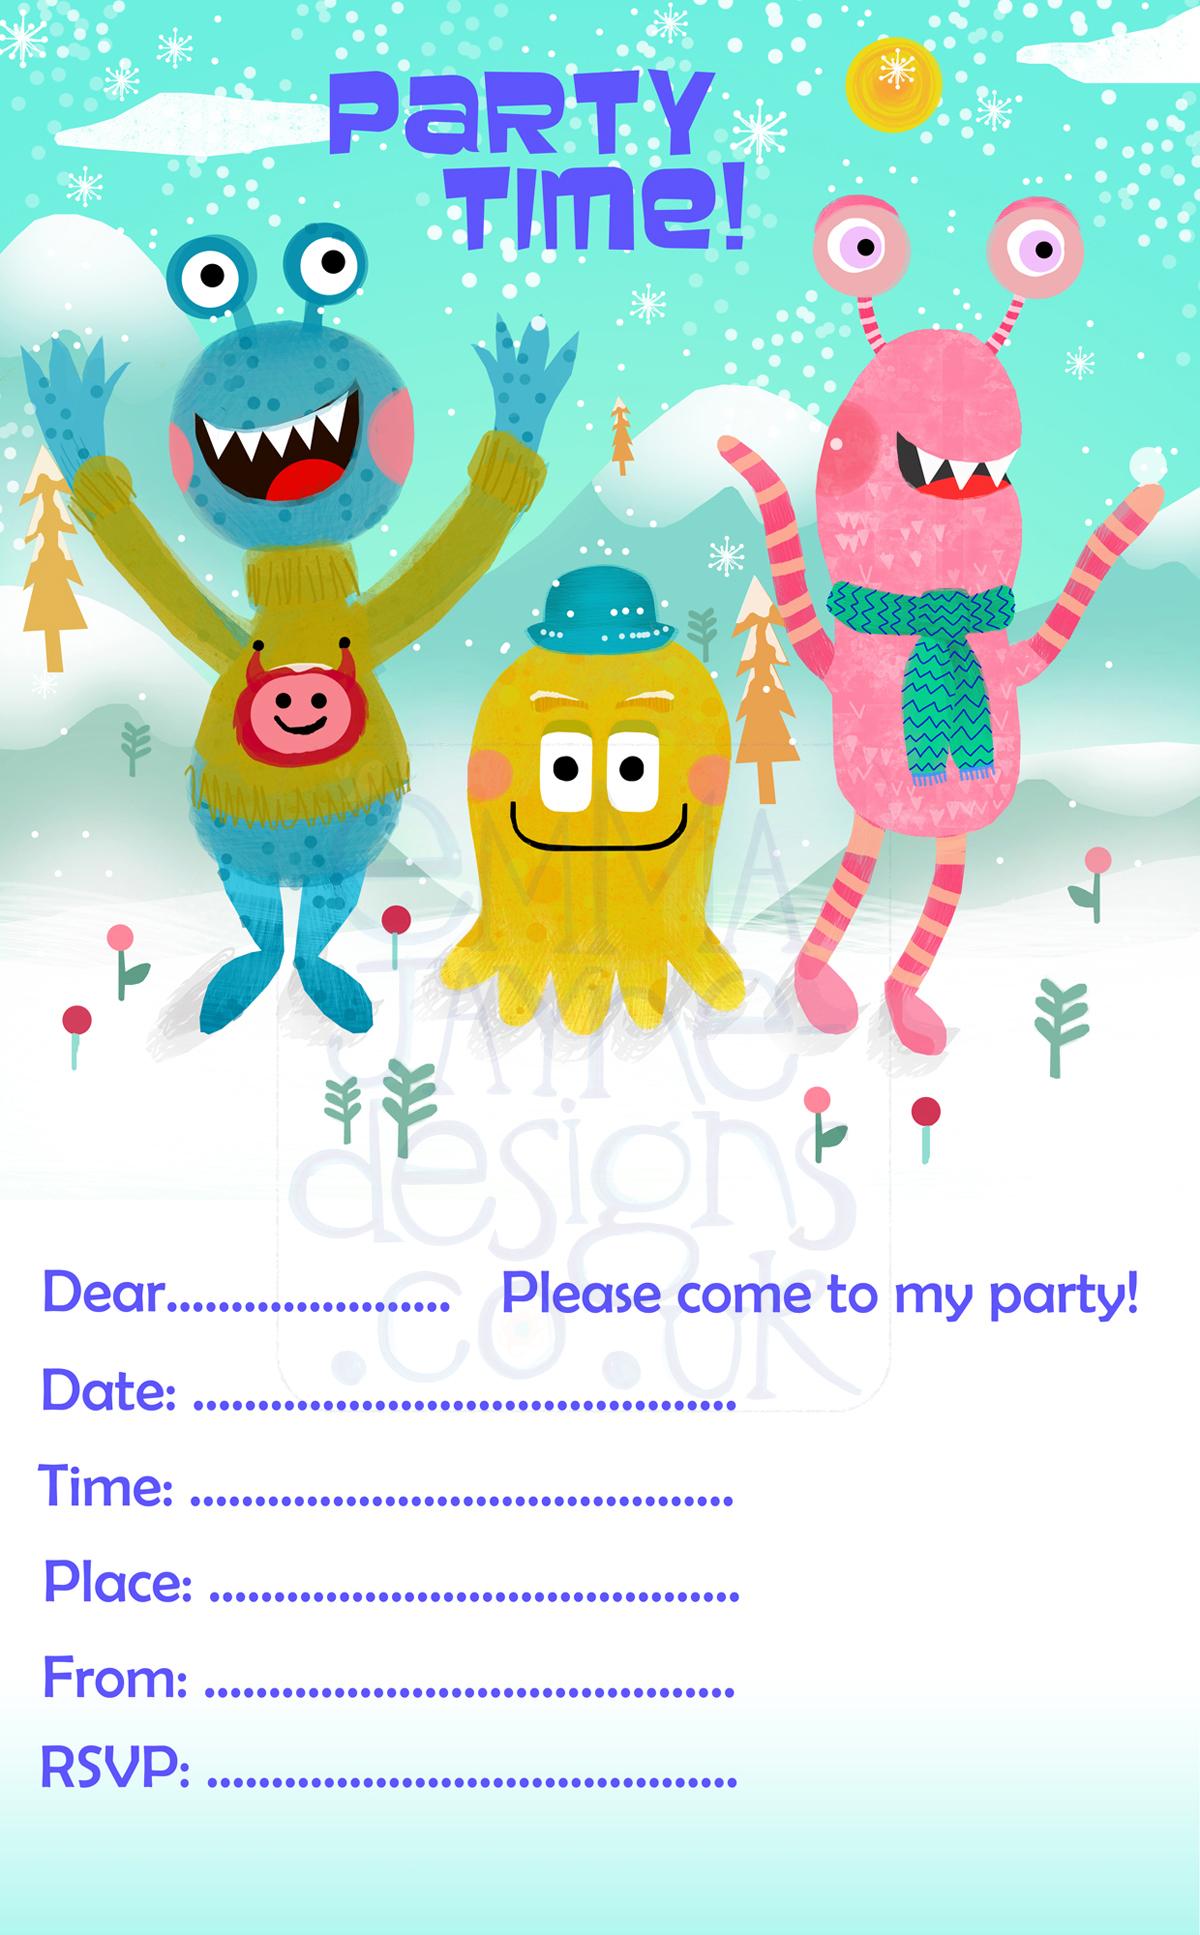 cute-monsters-character-illustration6-emmajayne-designs